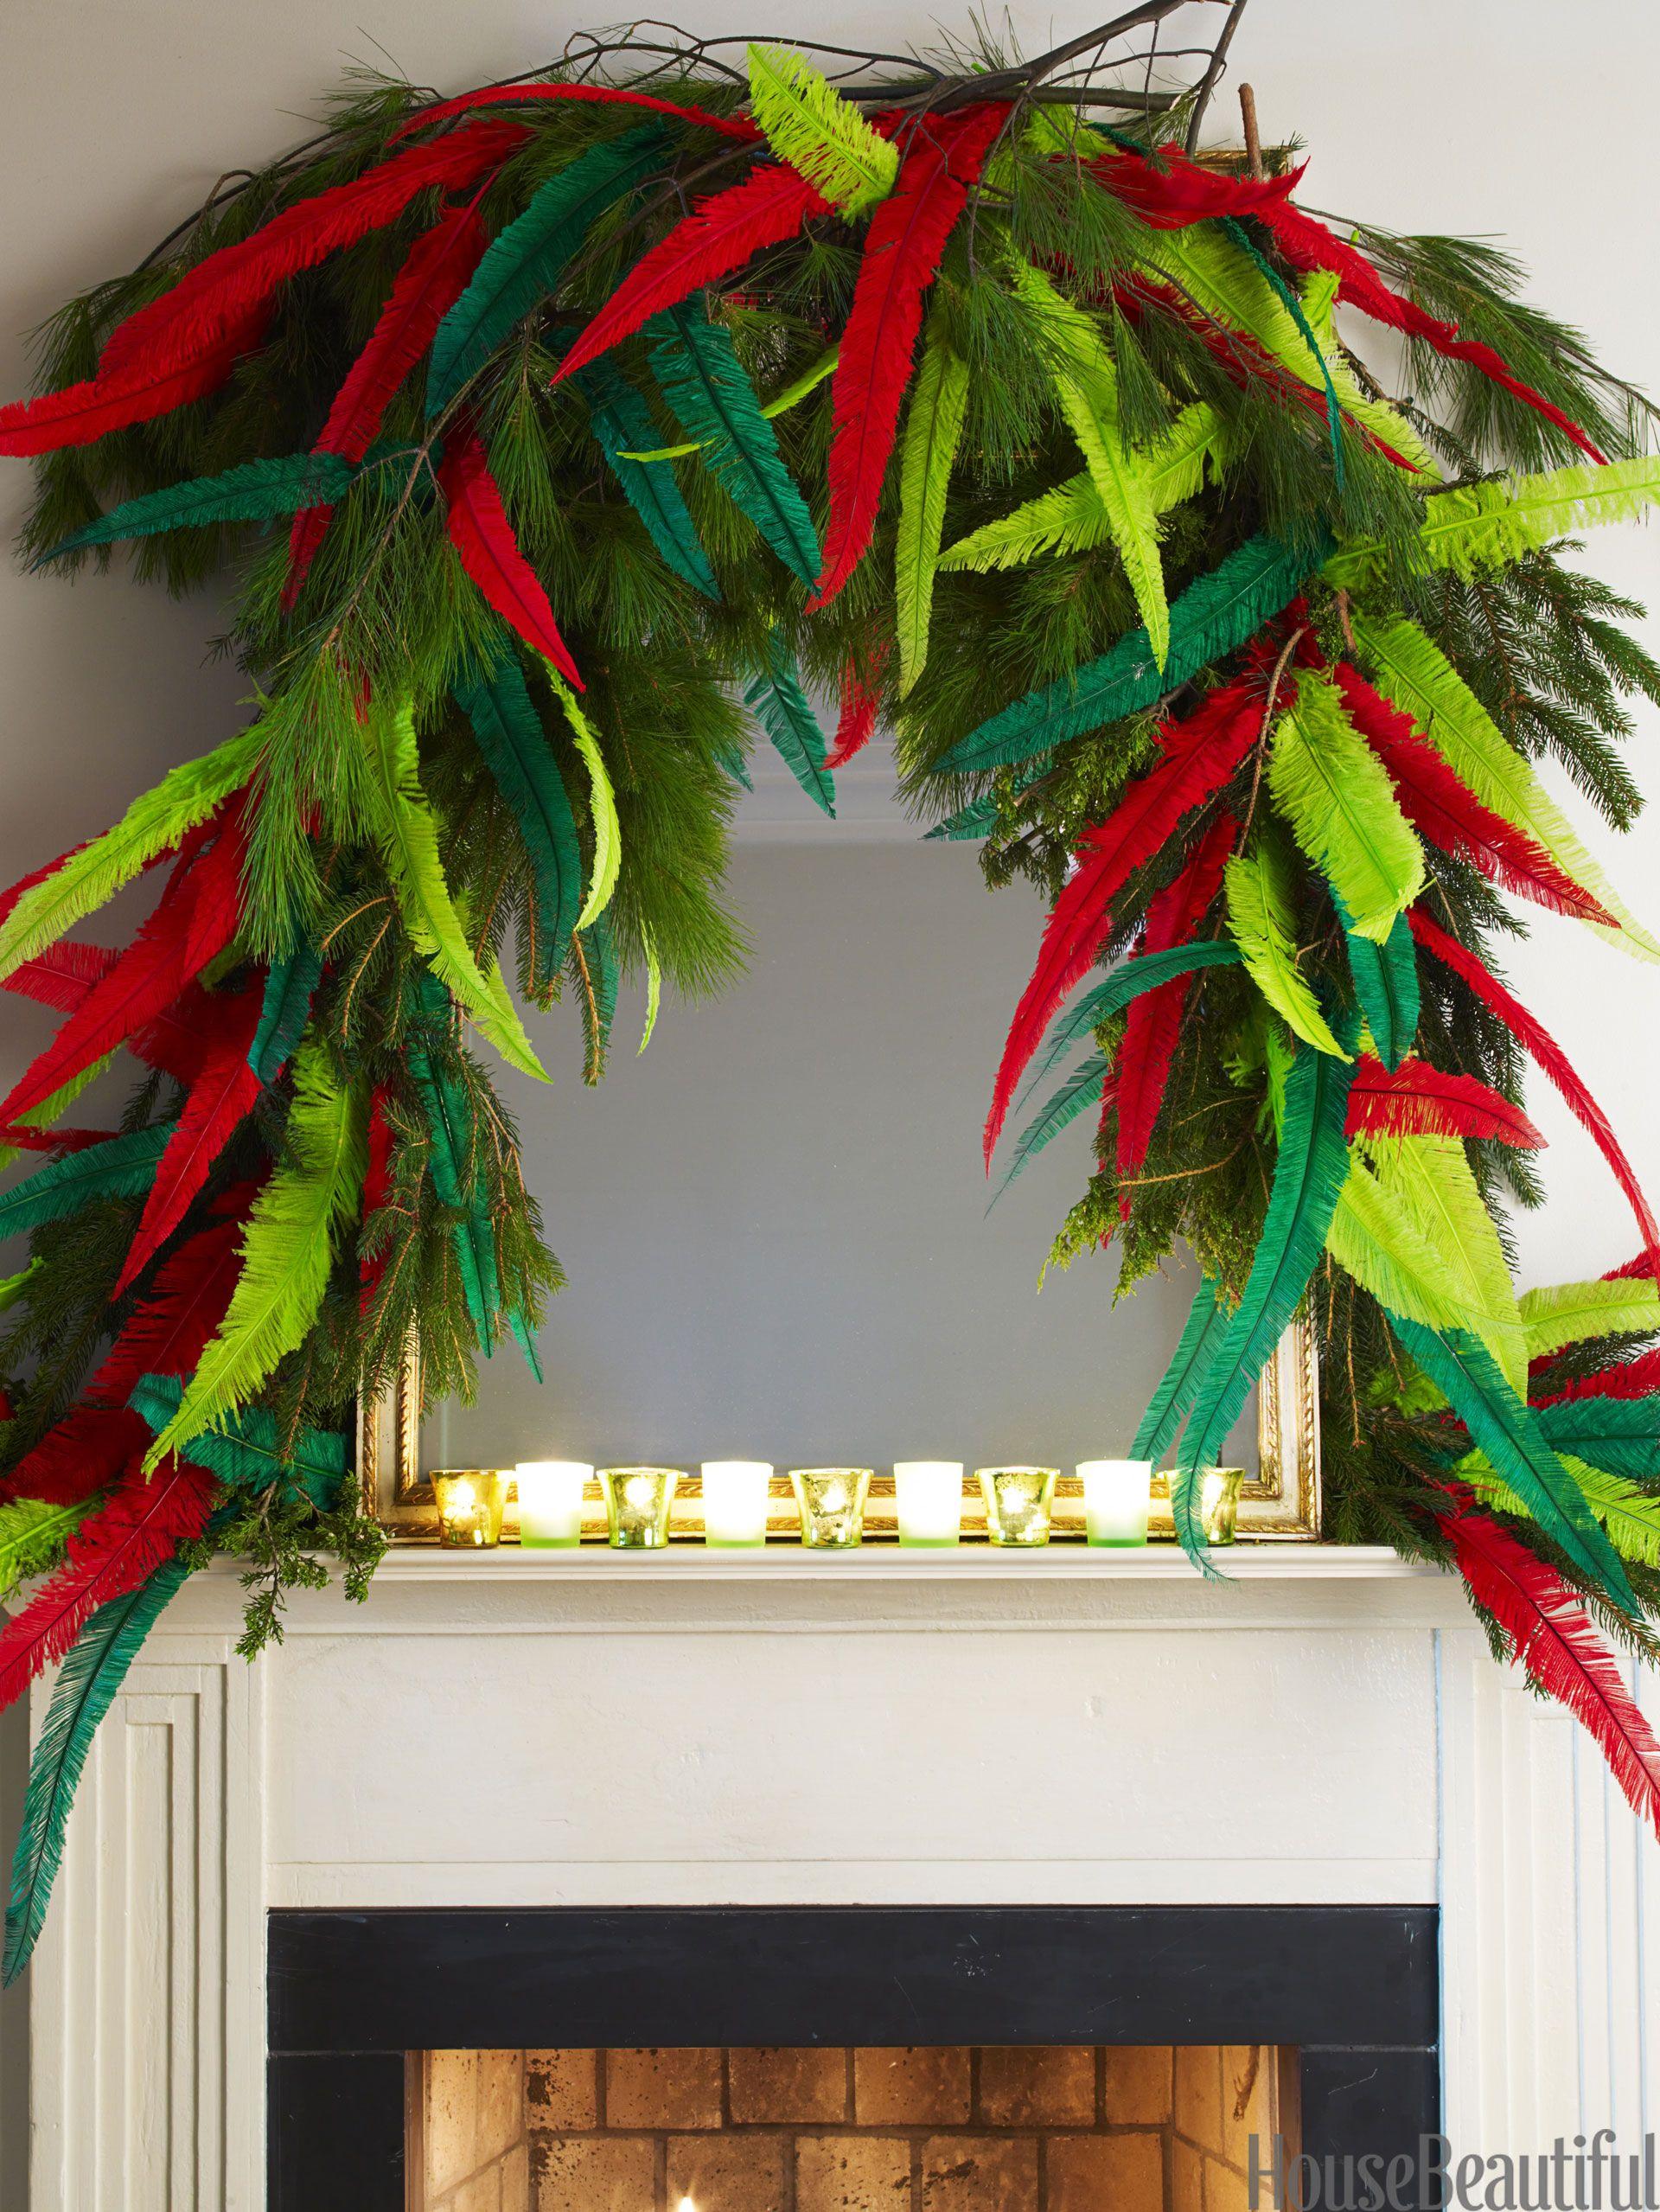 50 Christmas Home Decorating Ideas - Beautiful Christmas Decorations